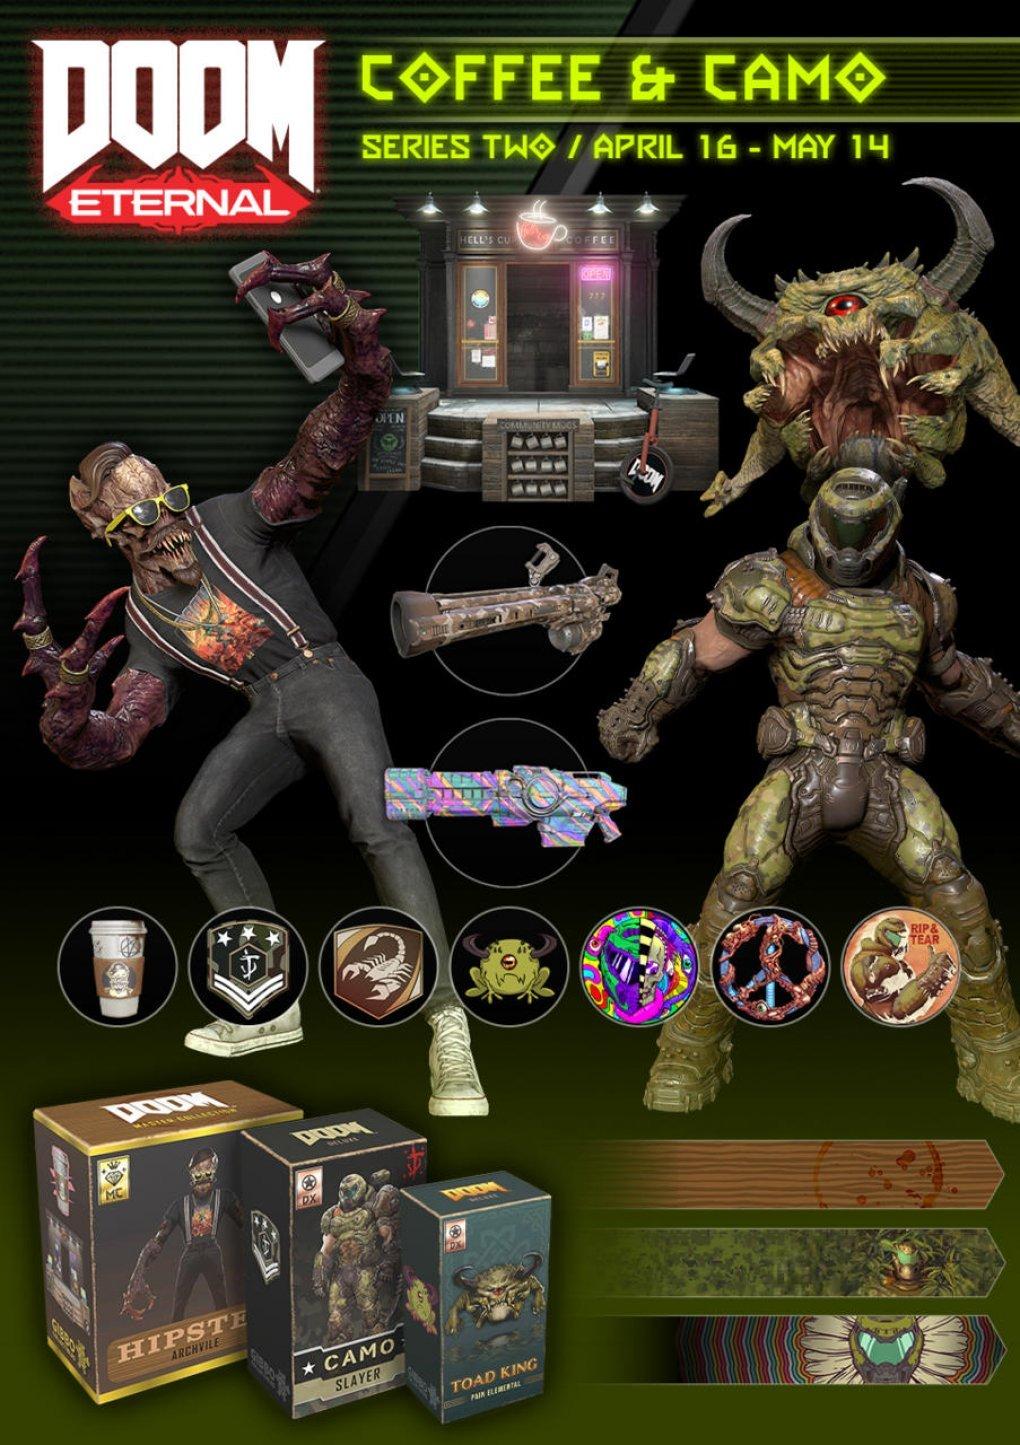 Doom-Eternal-Coffee-Camo-Event-pc-games.jpg